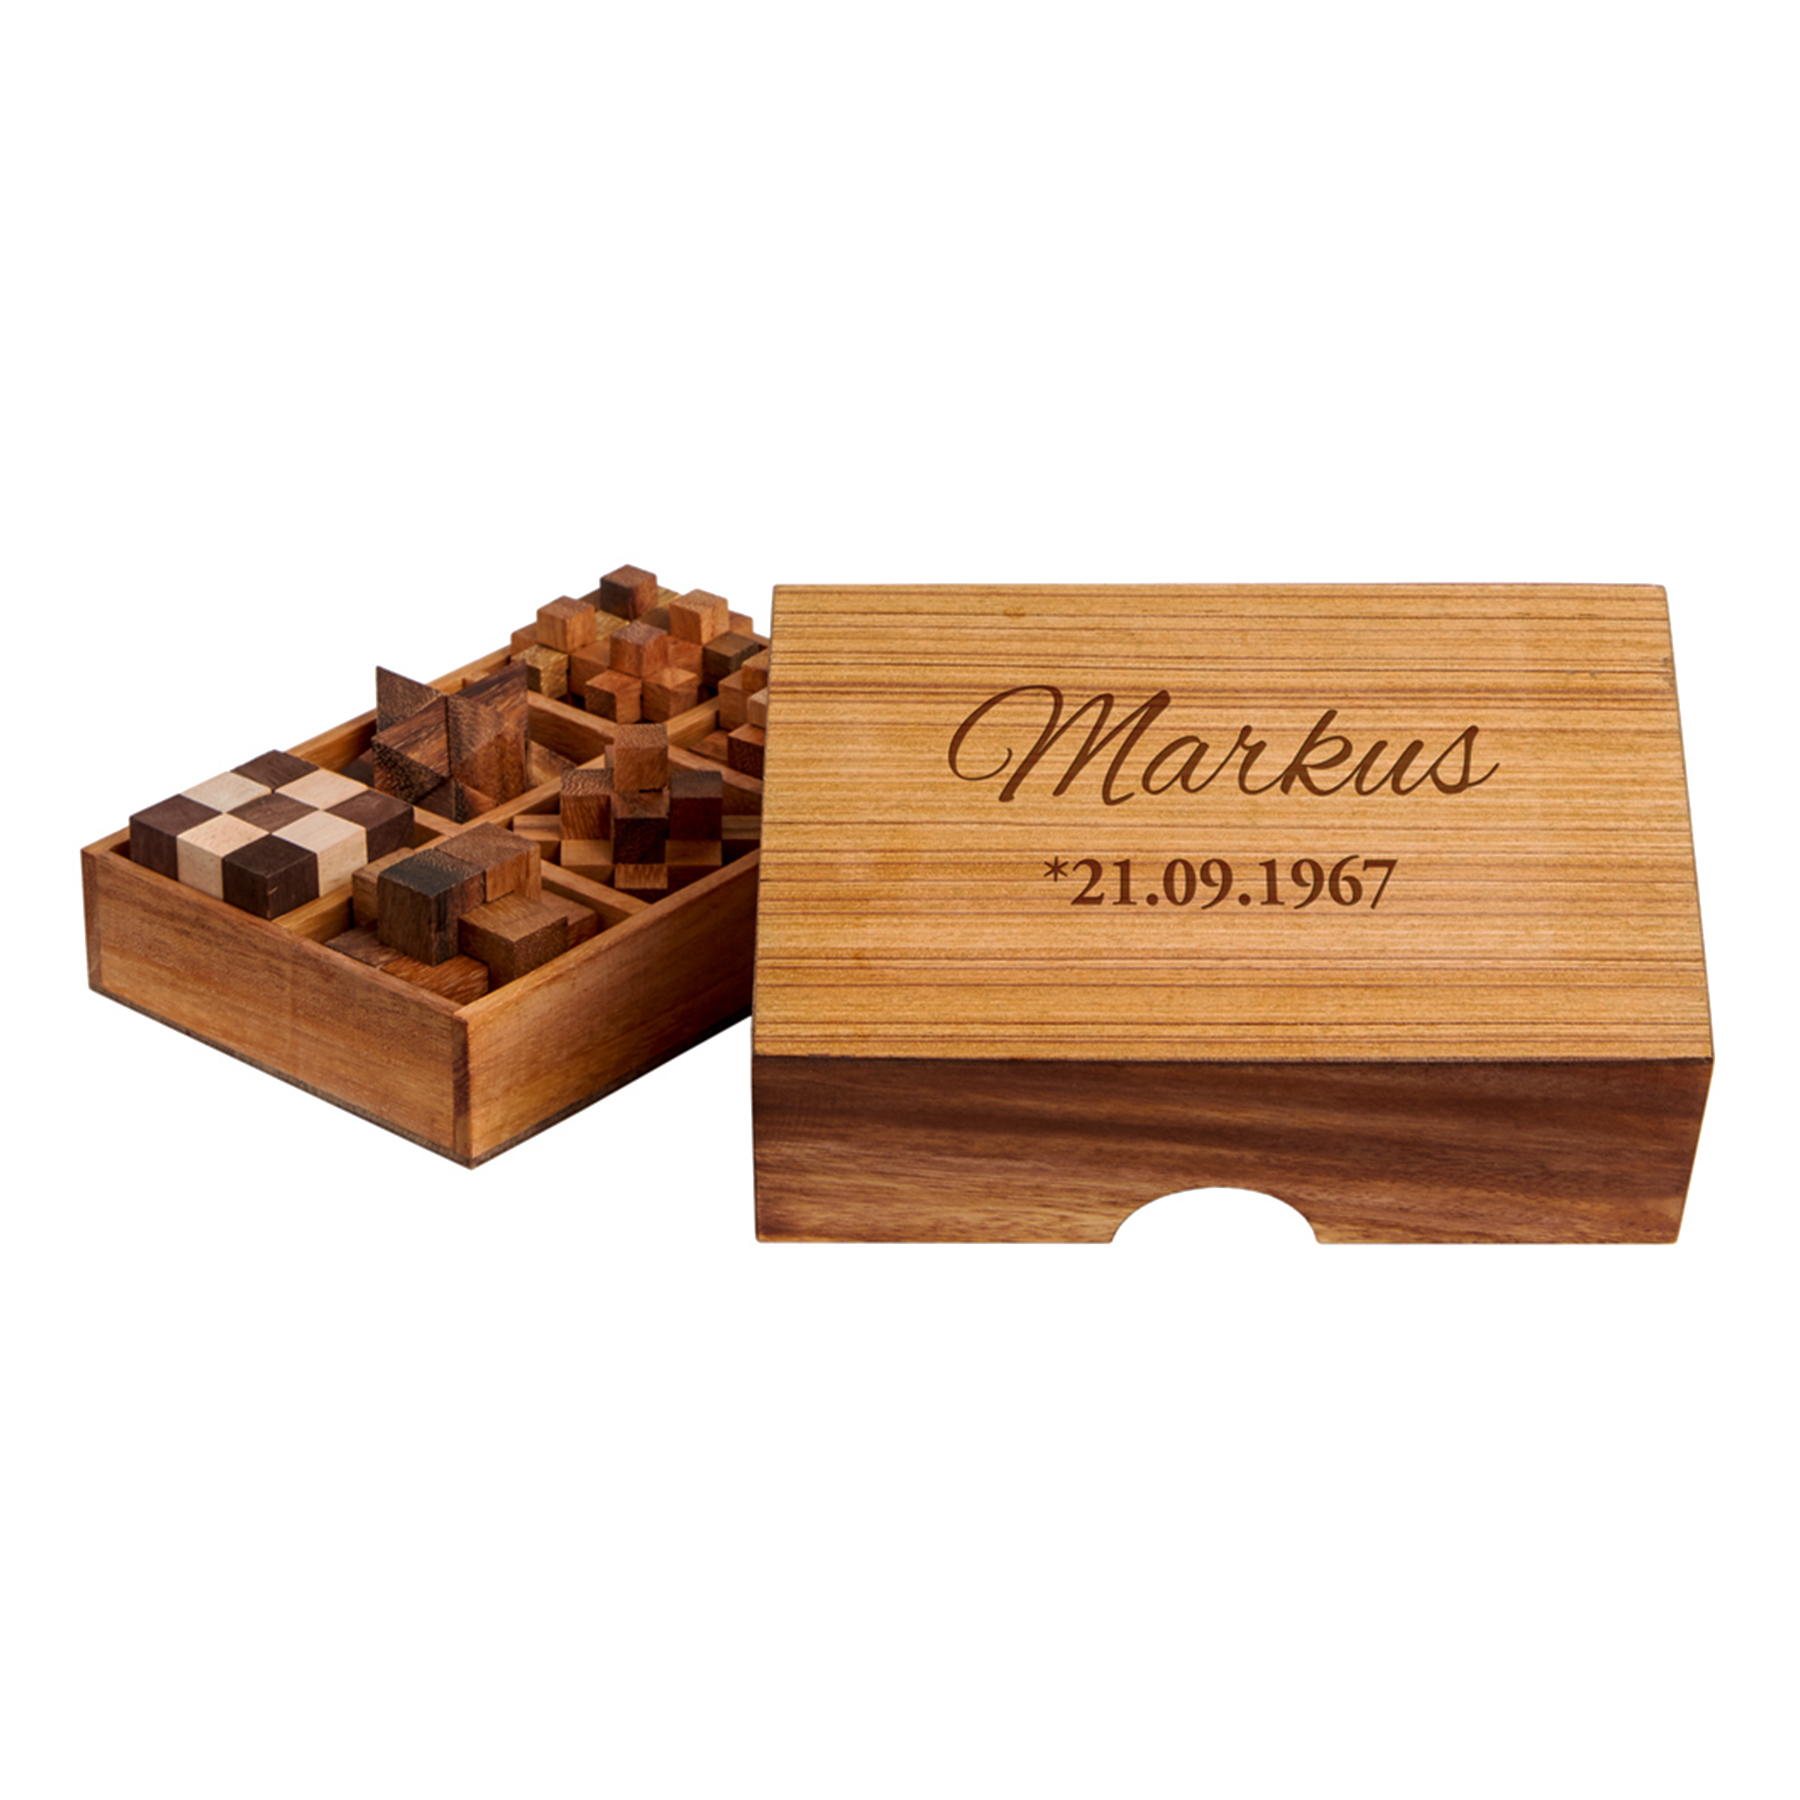 Holz Knobelspiele